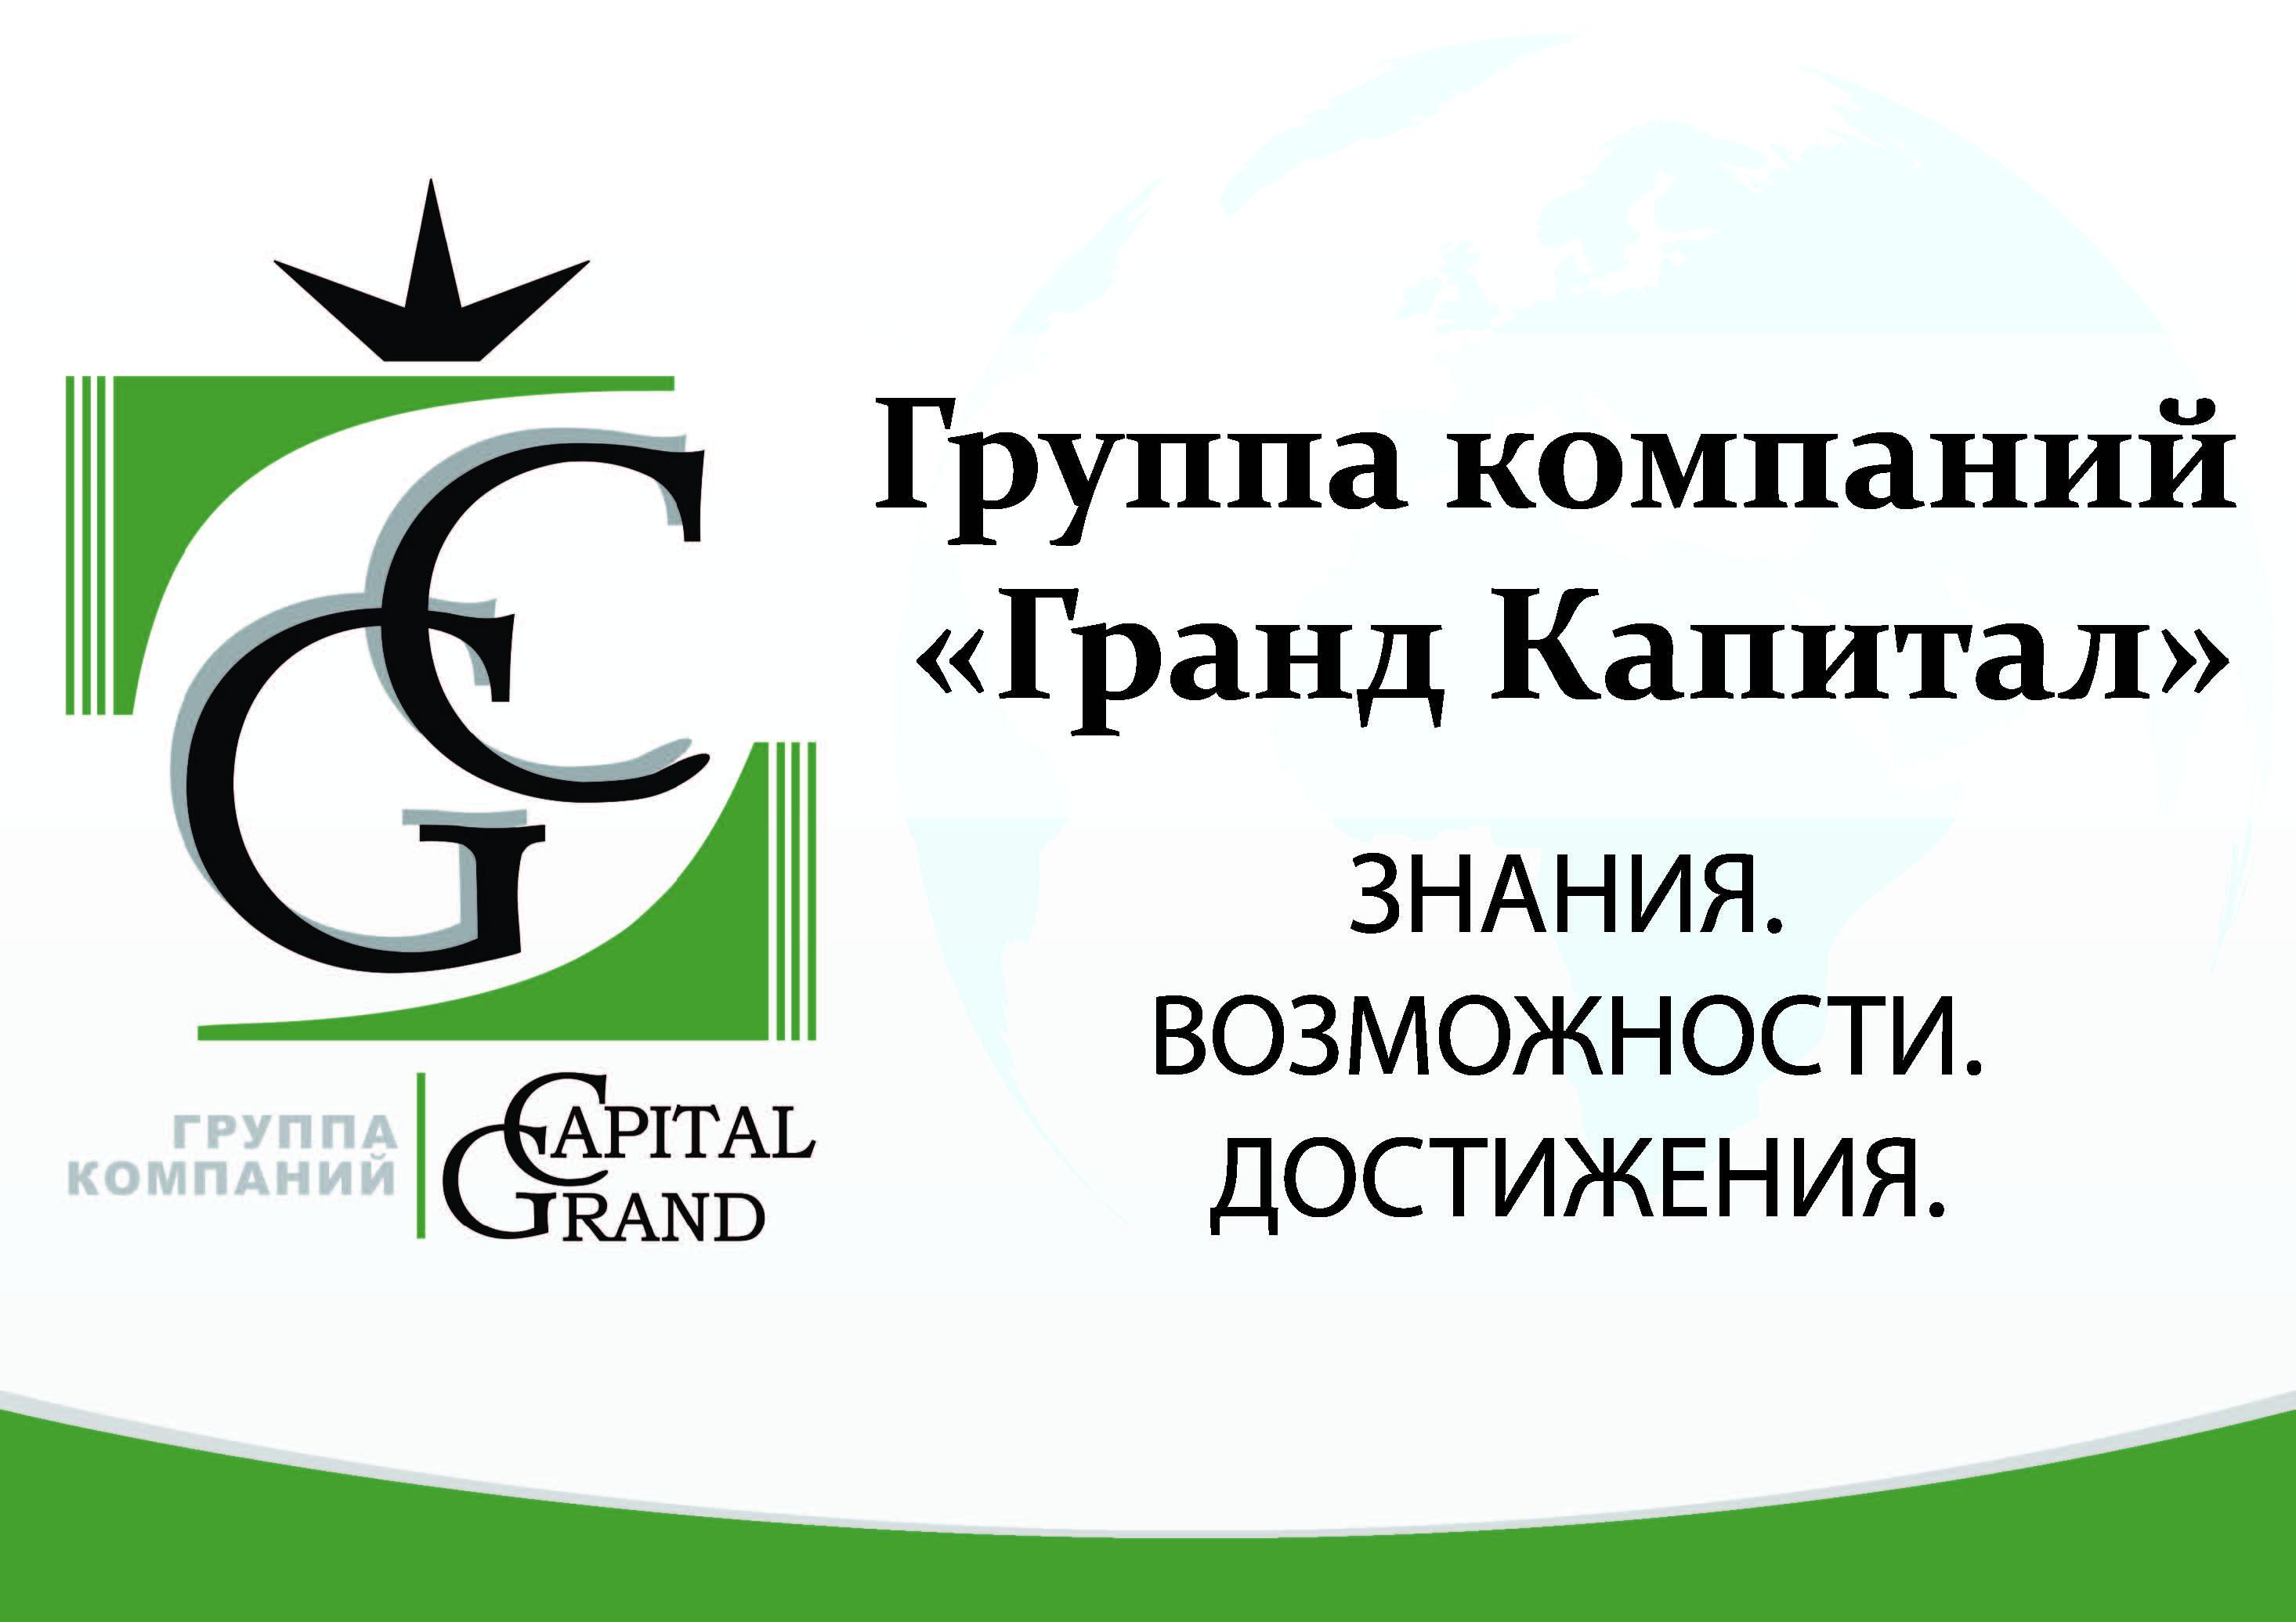 презентация гранд капитал_Page_01